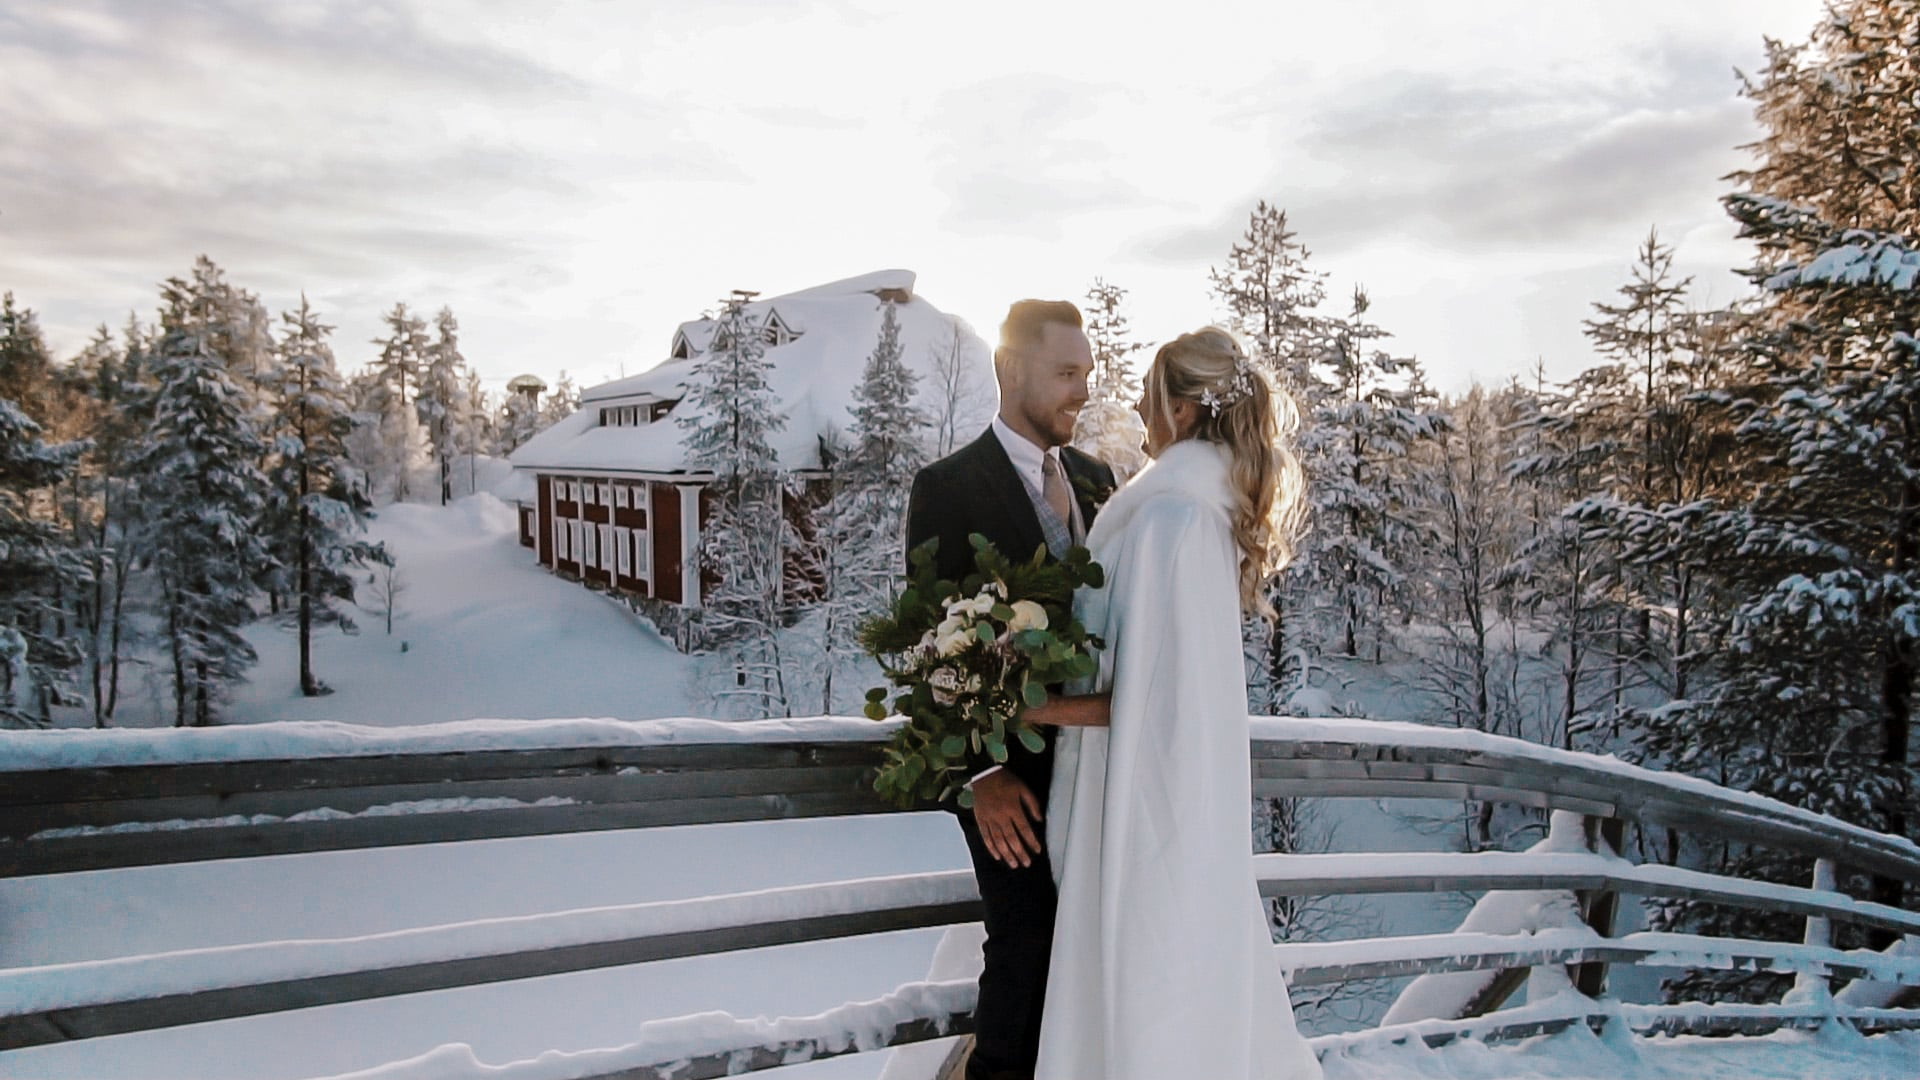 Emilie & Josh 2020 Wedding Highlights